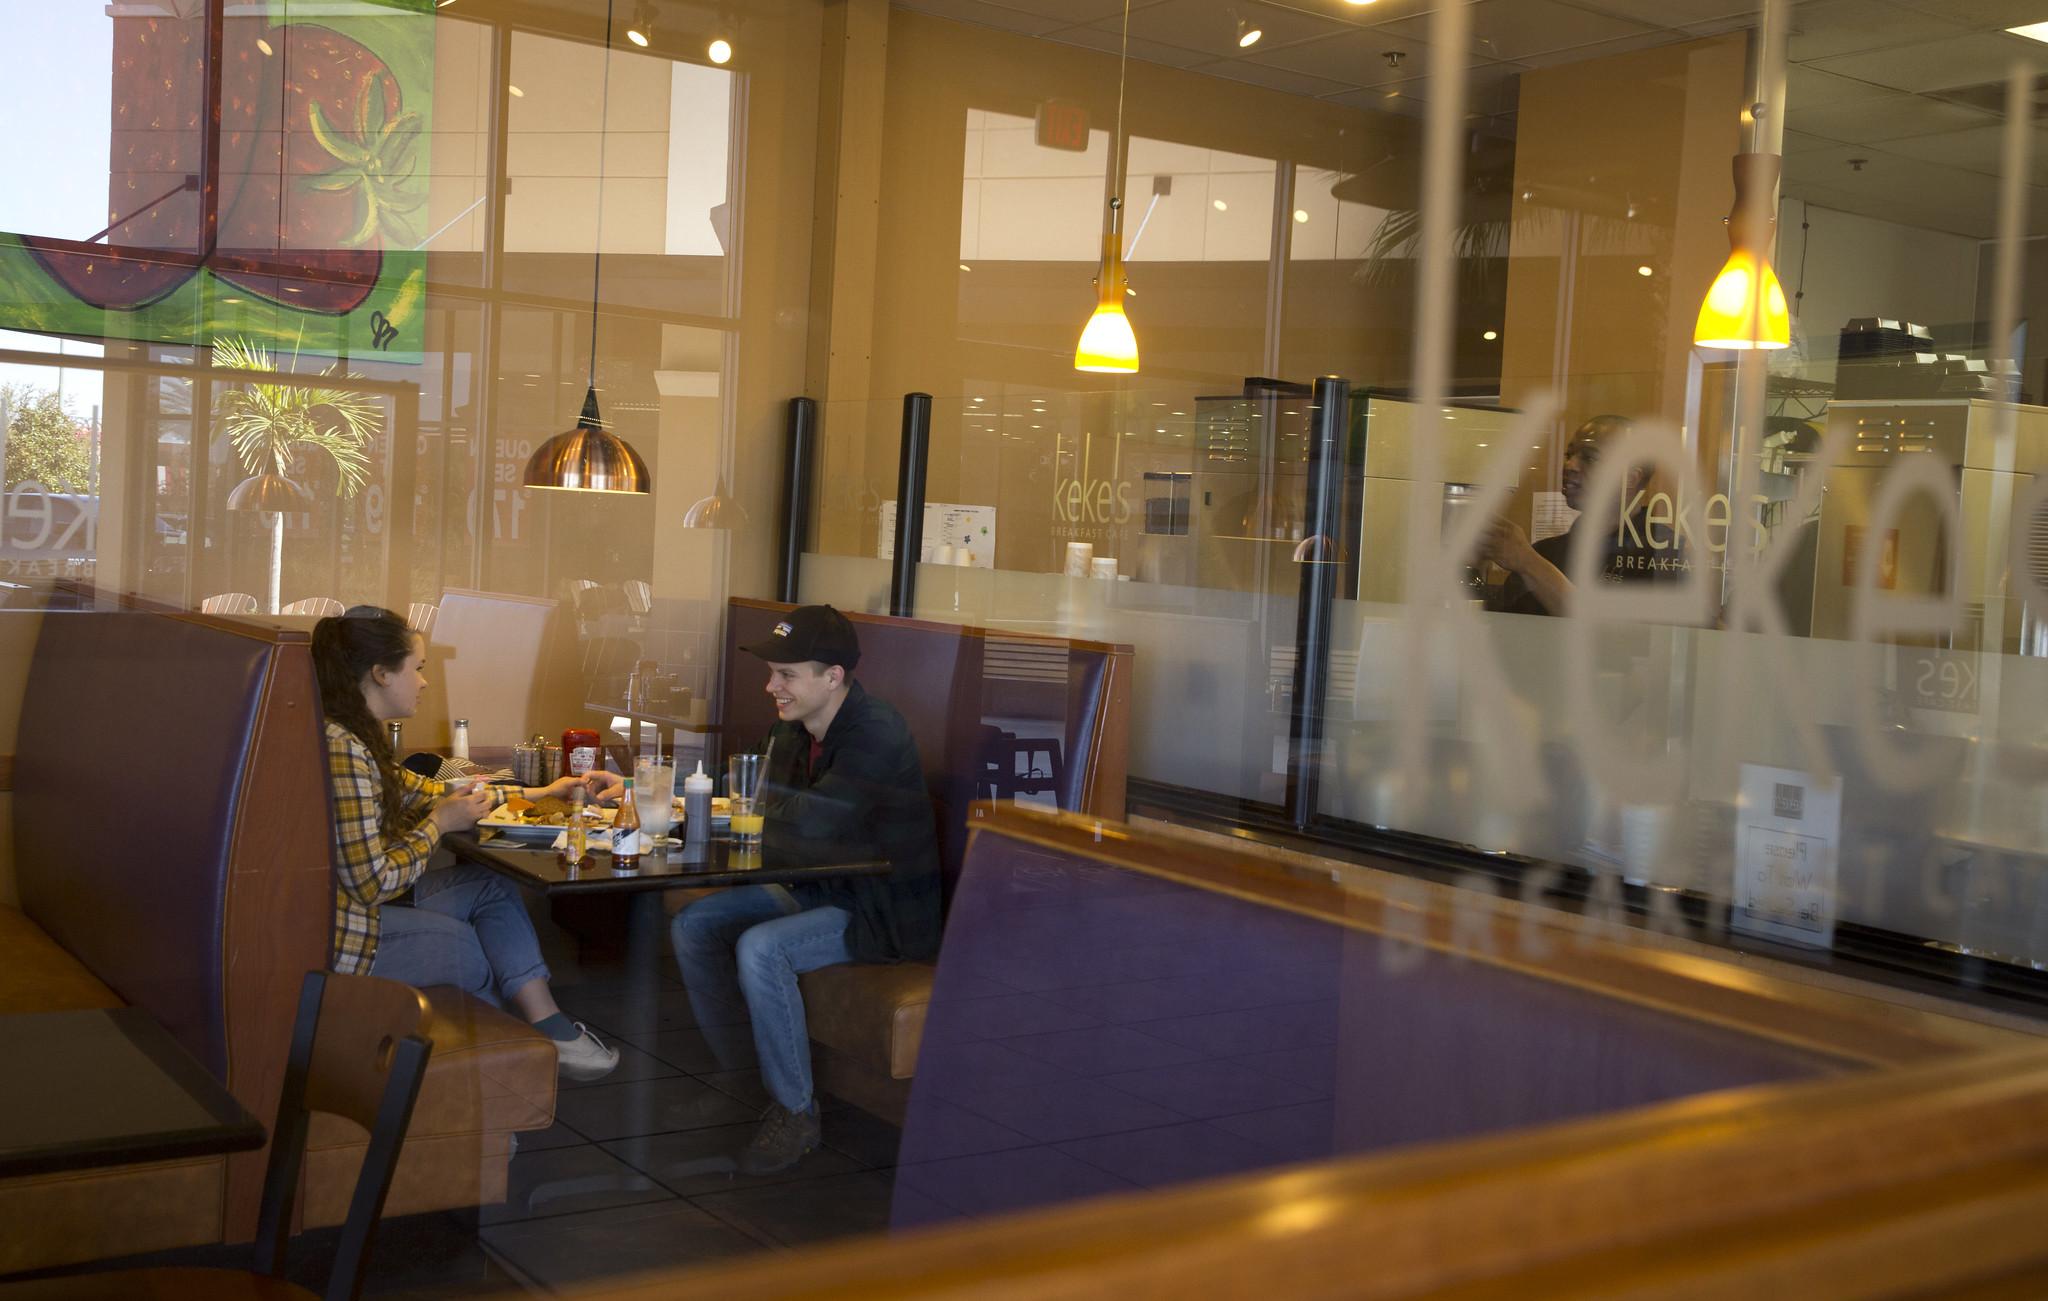 Keke S Cafe Riverview Fl Opening Date